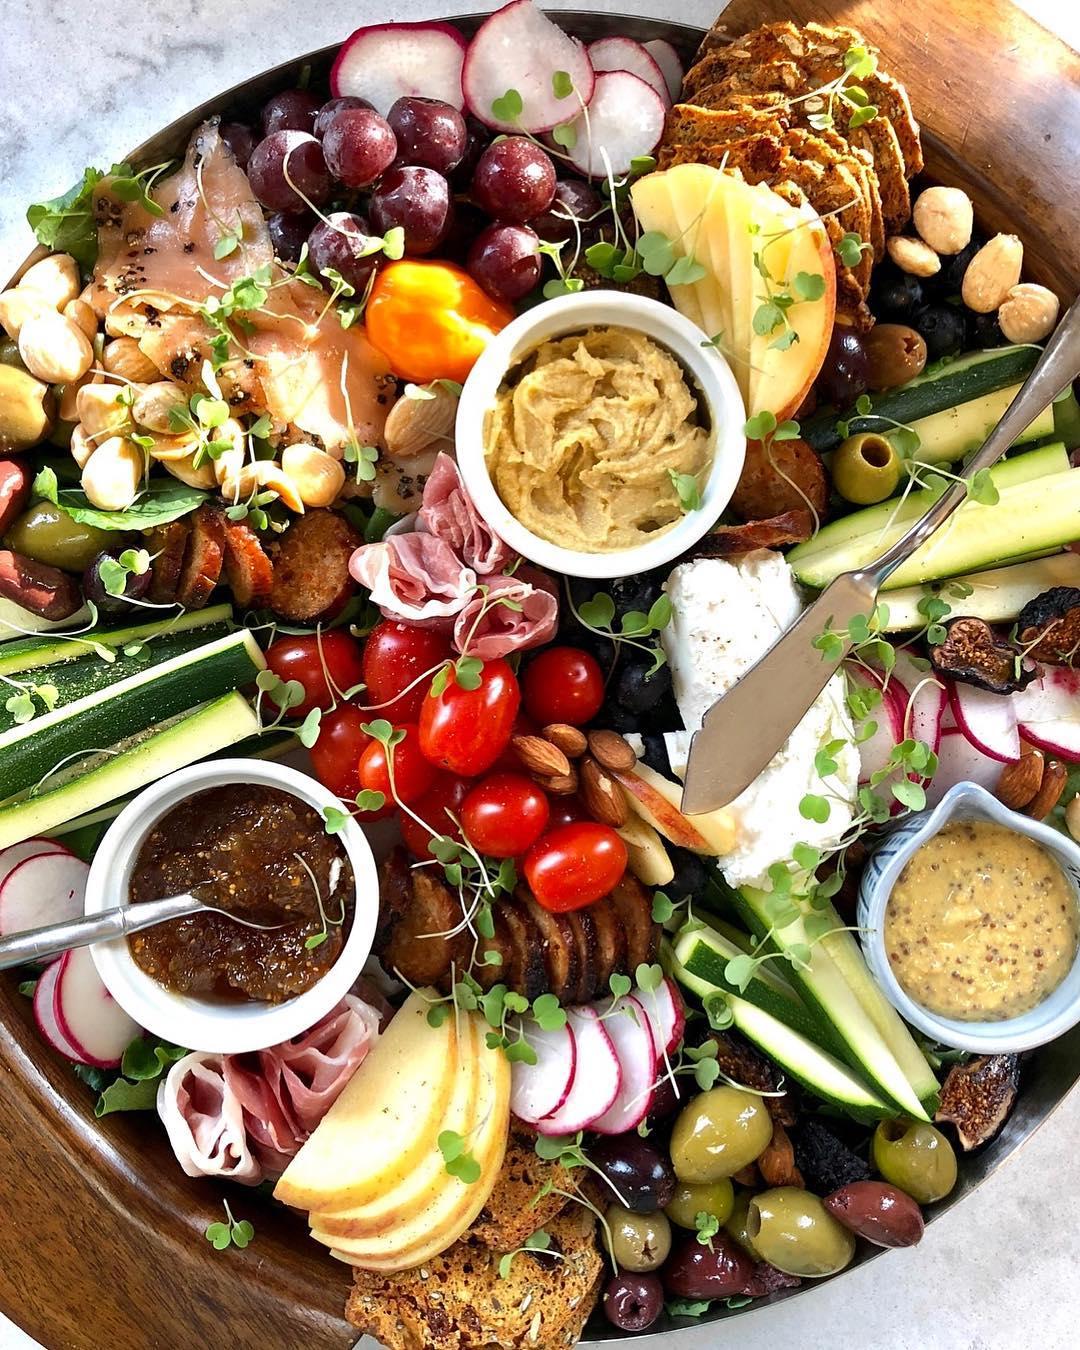 Veggie, Cheese & Charcuterie Platter.jpg